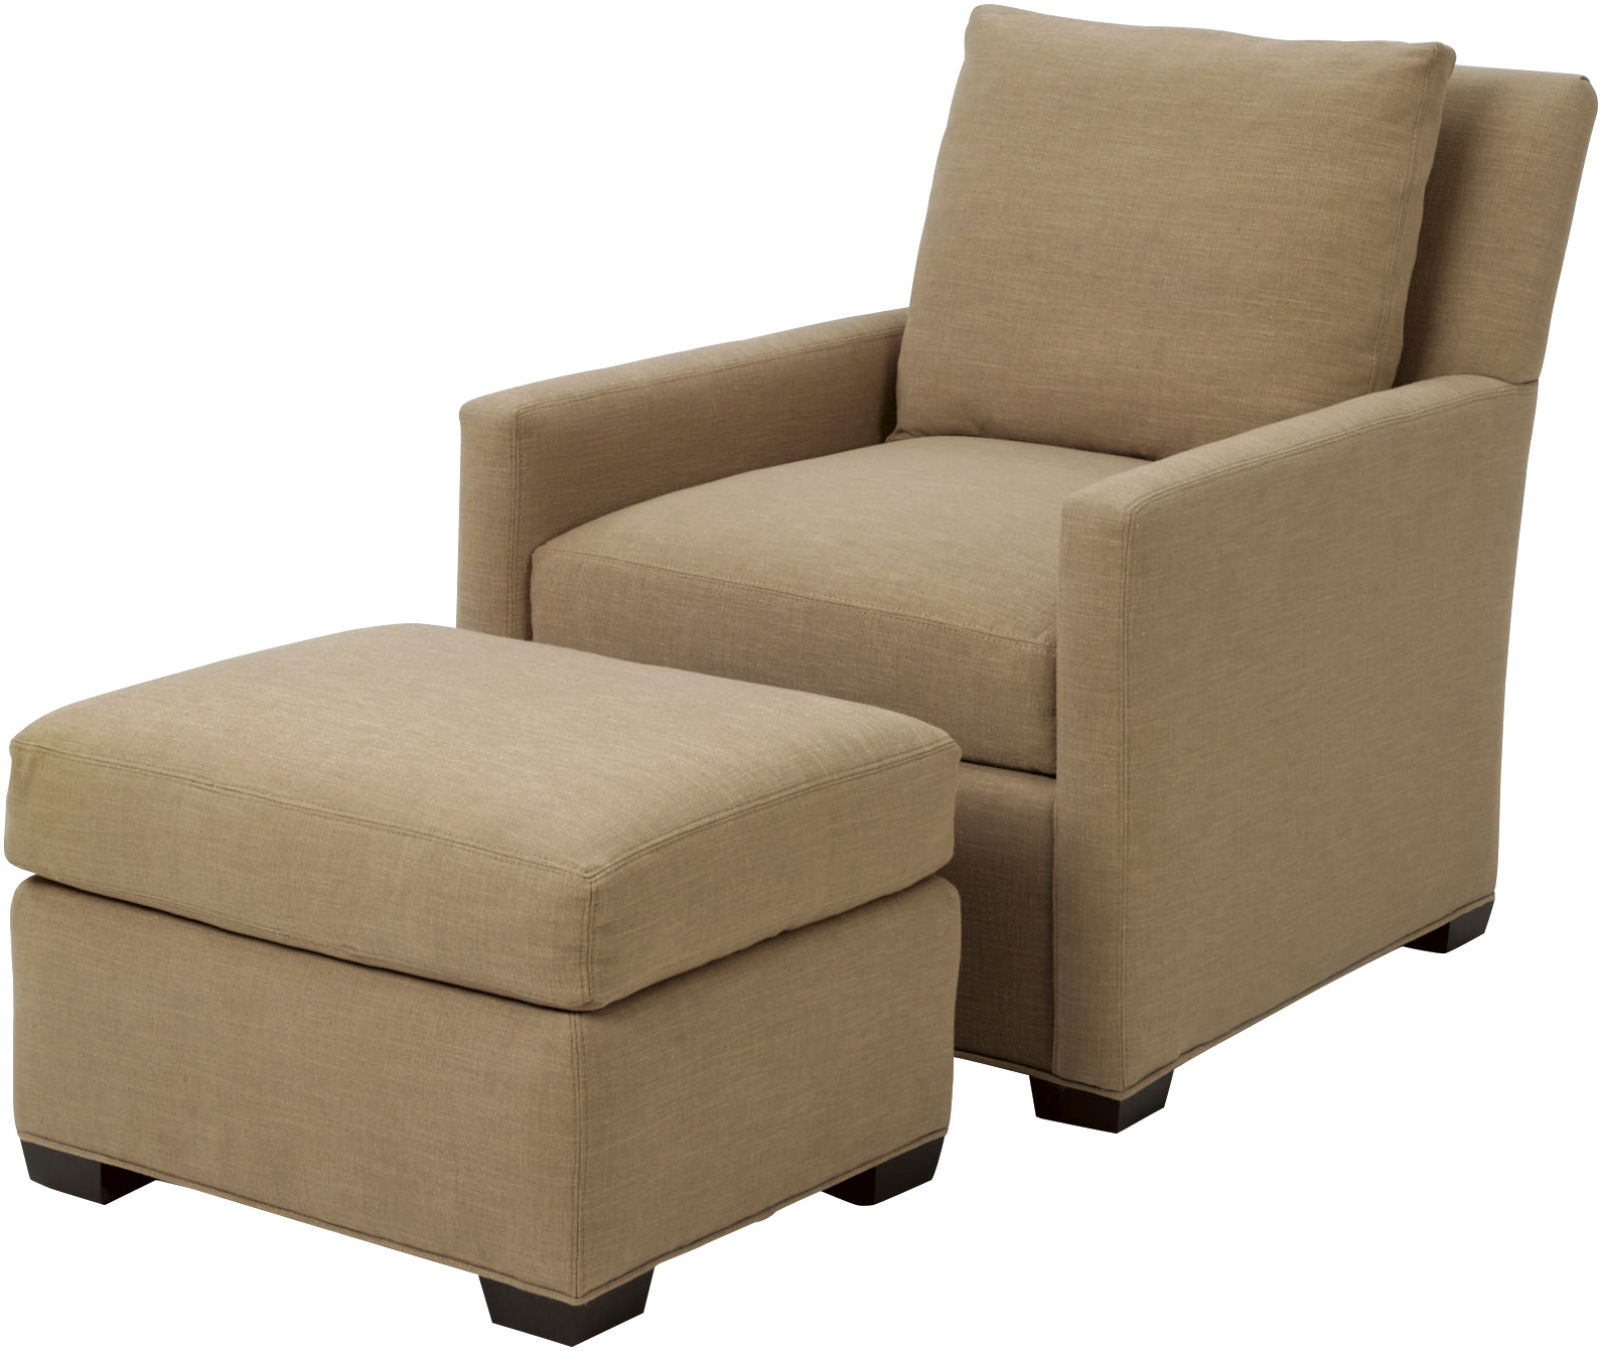 wesley hall sofas la z boy twin sleeper sofa furniture - hickory, nc product page 674 chair